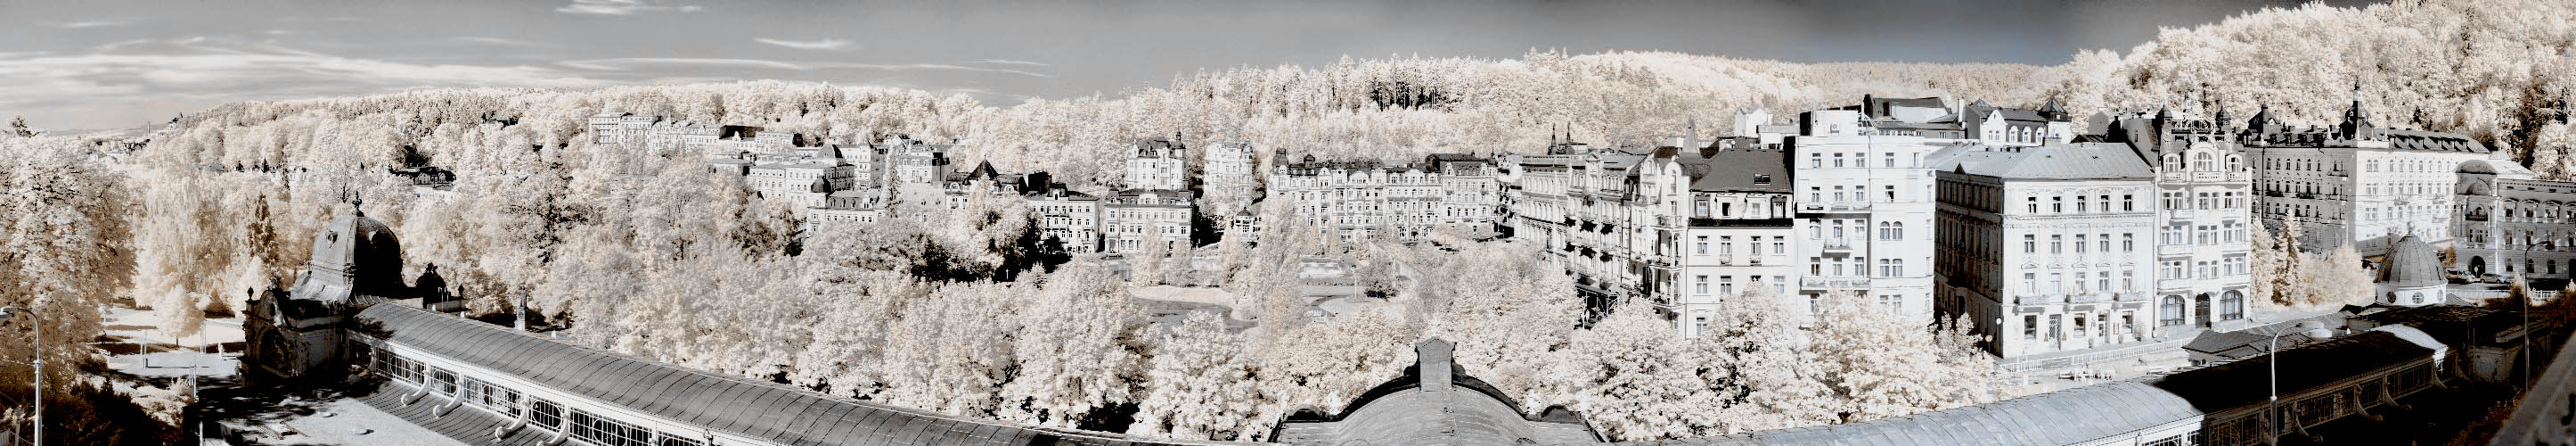 IRres HDR-Panorama von Marienbad